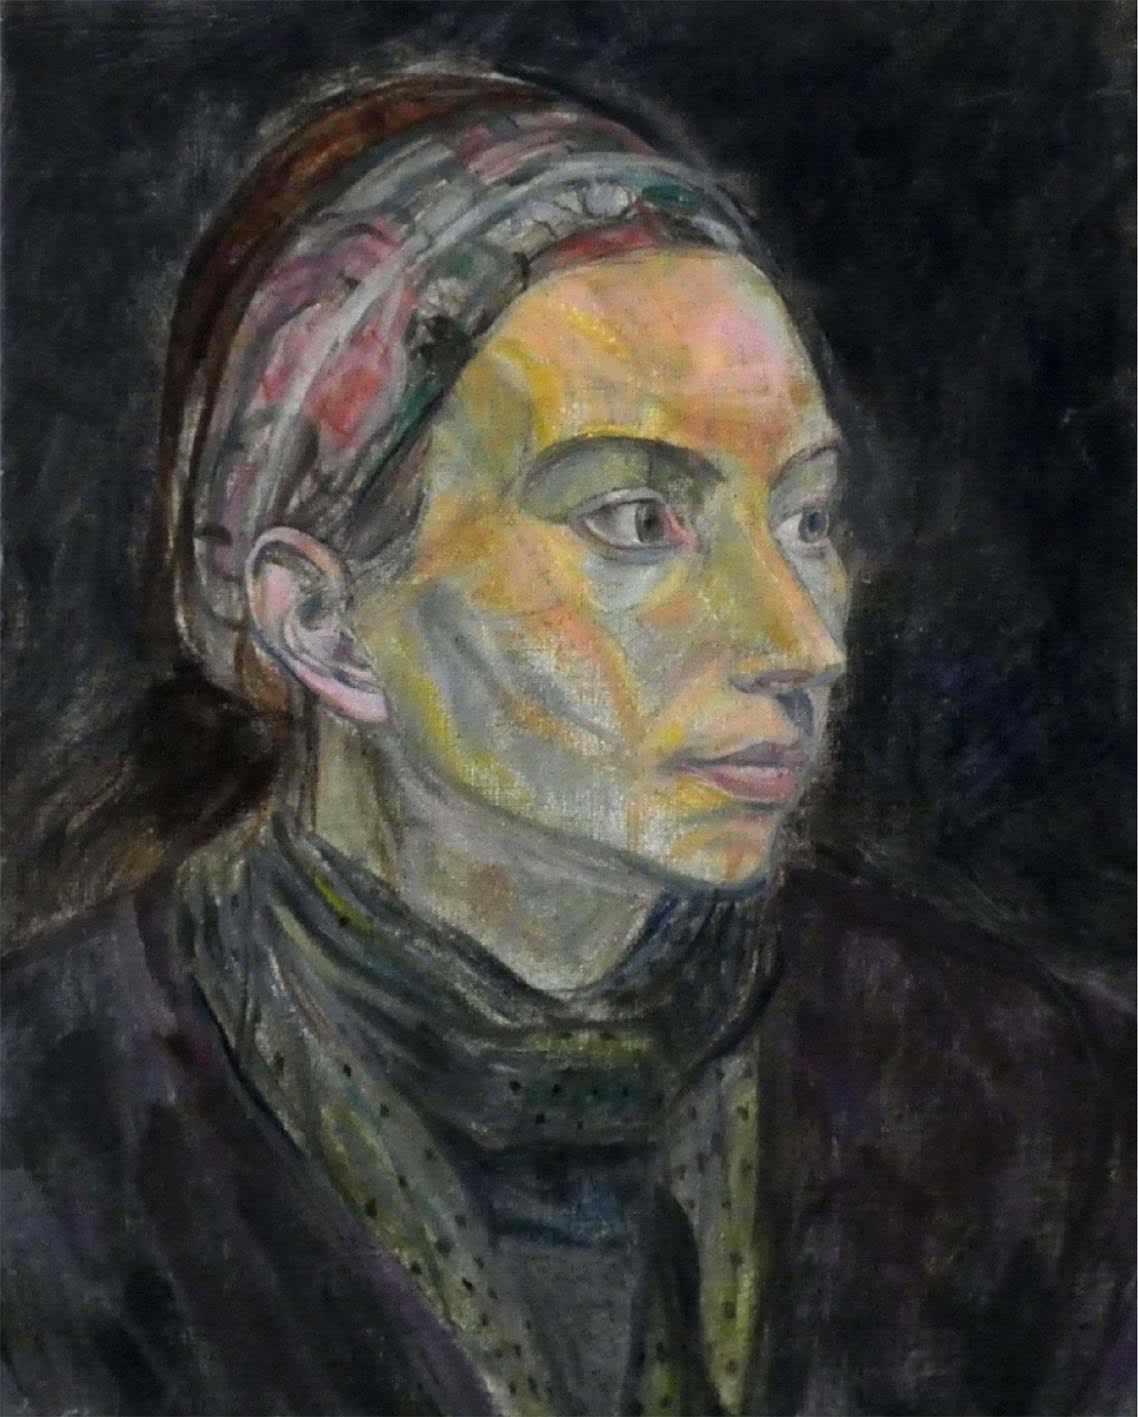 Leonard Mccomb, Portrait of a lady with a headscarf, circa 1999